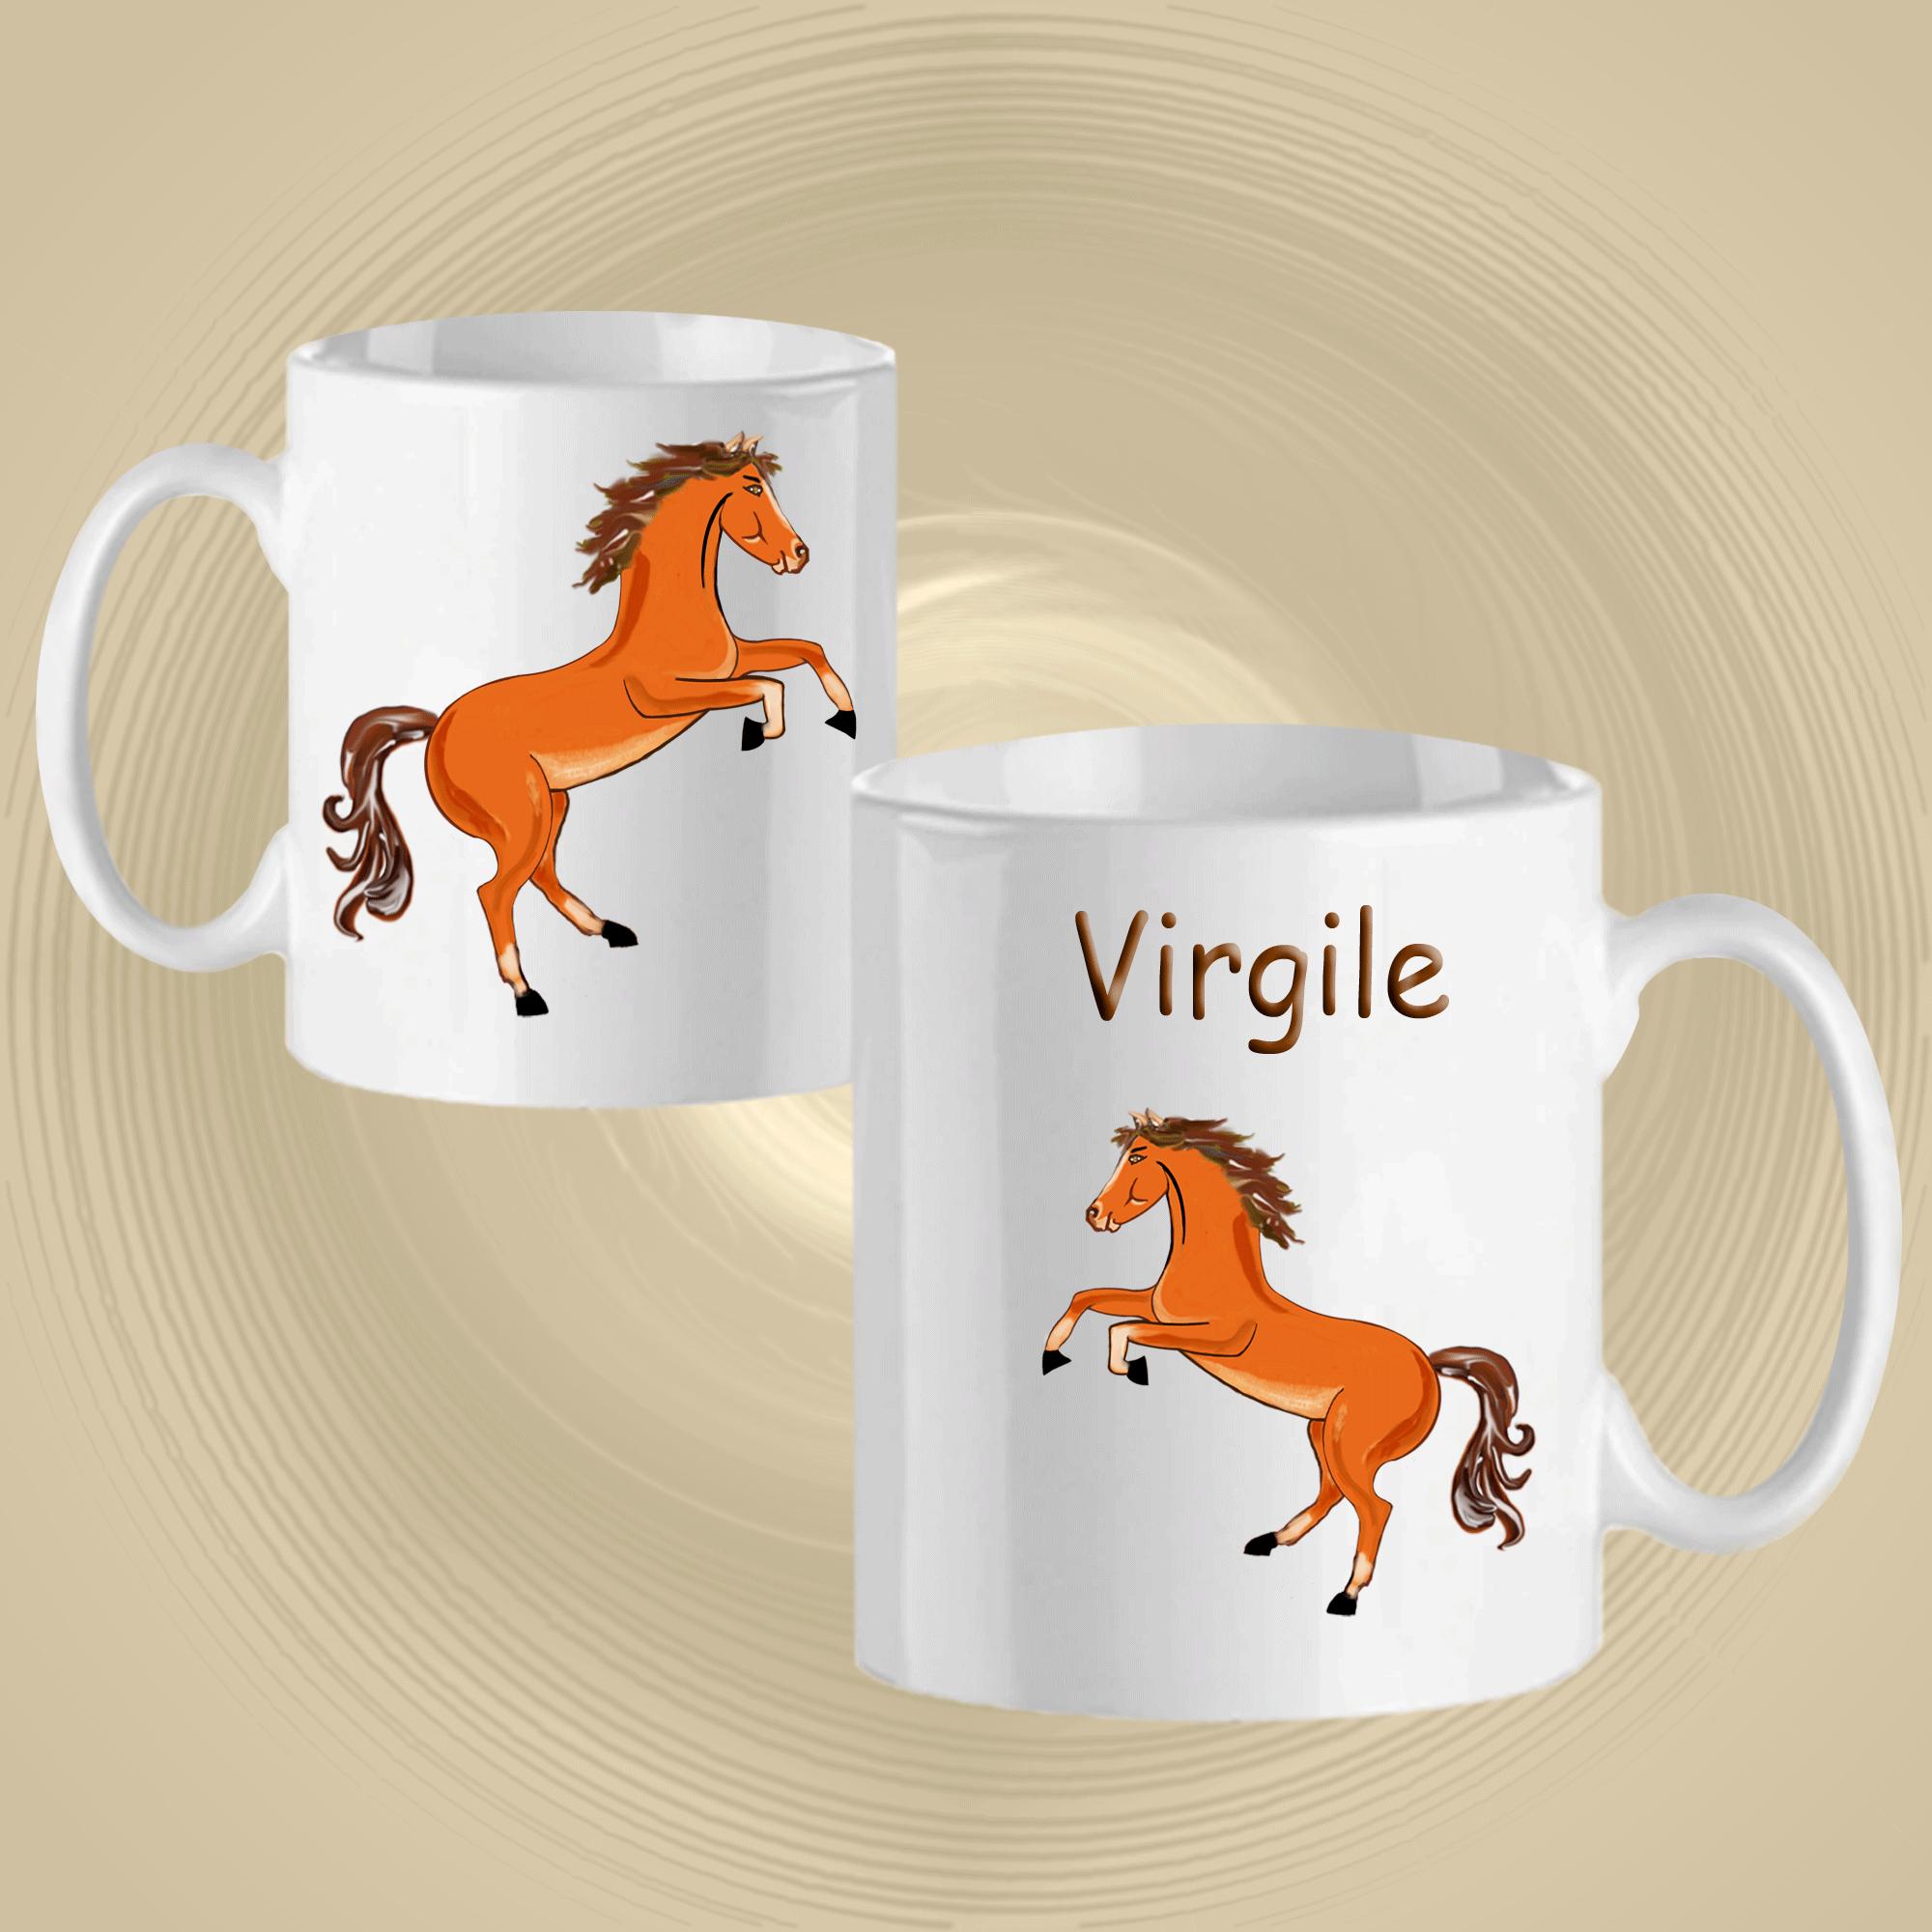 mug-cheval-cabre-prenom-personnalisable-personnalisation-personnalise-blanc-ceramique-tasse-animal-mammifere-virgile